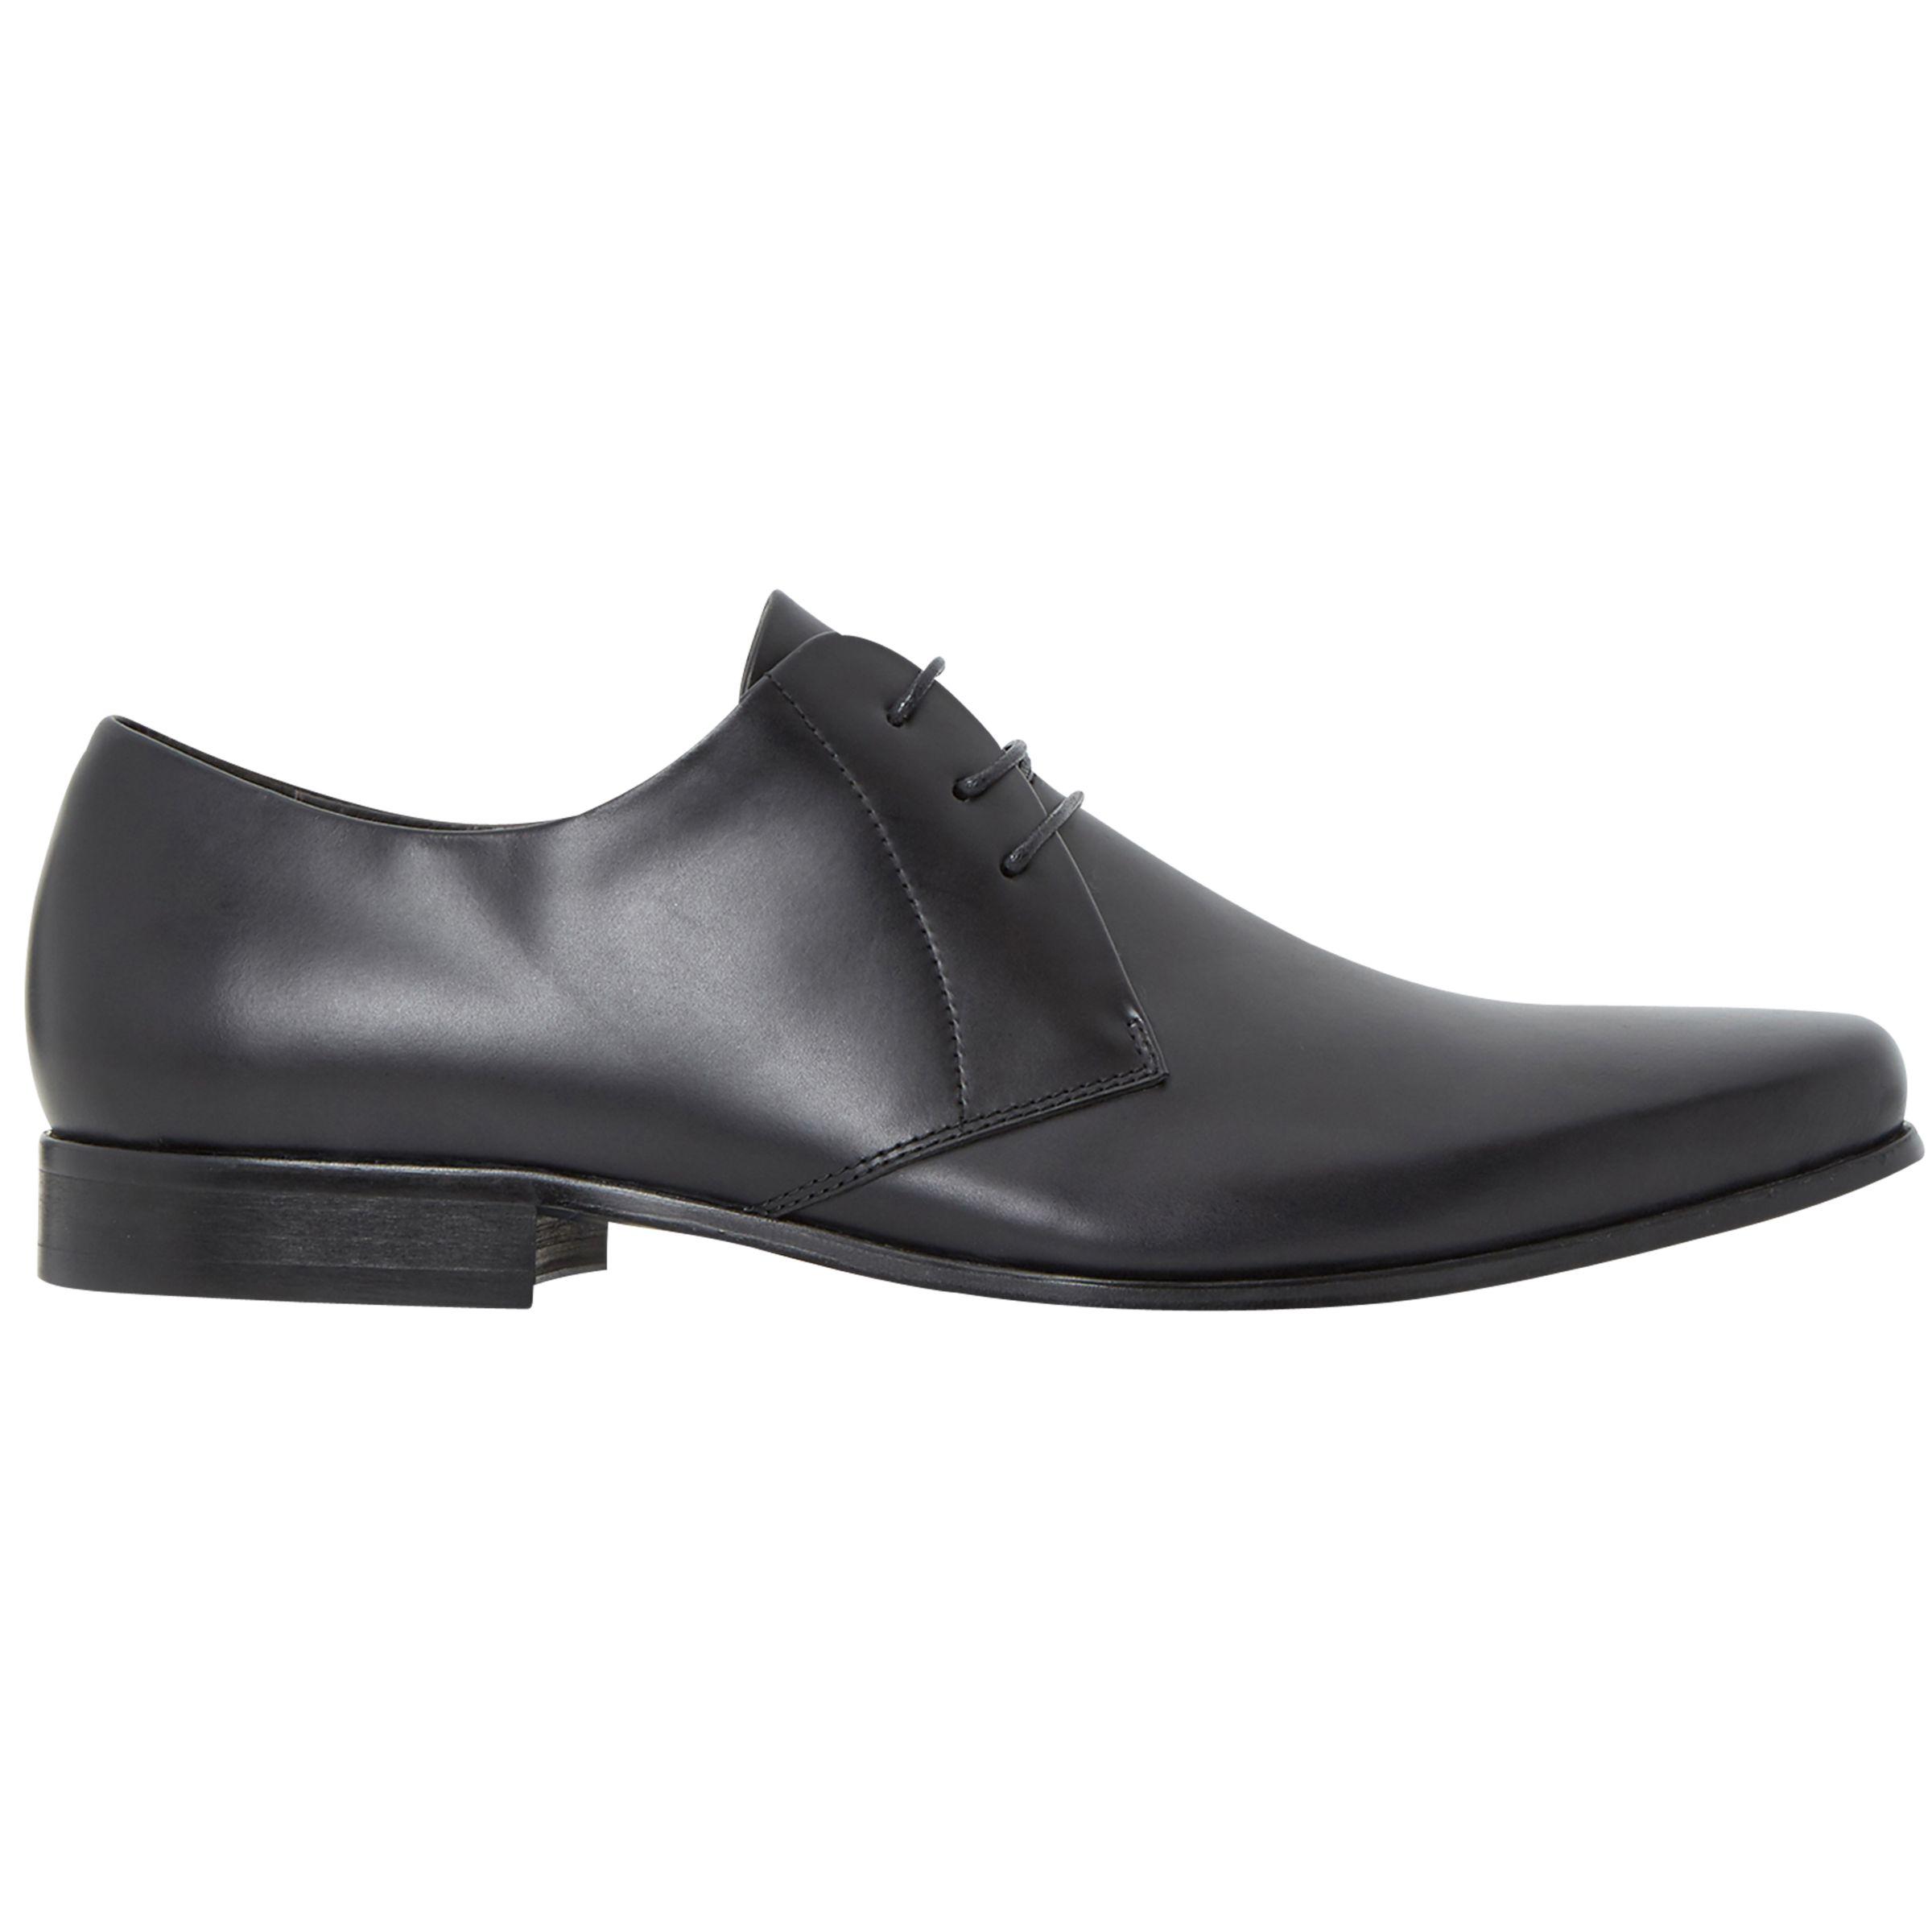 Bertie Bertie Police Leather Derby Shoes, Black